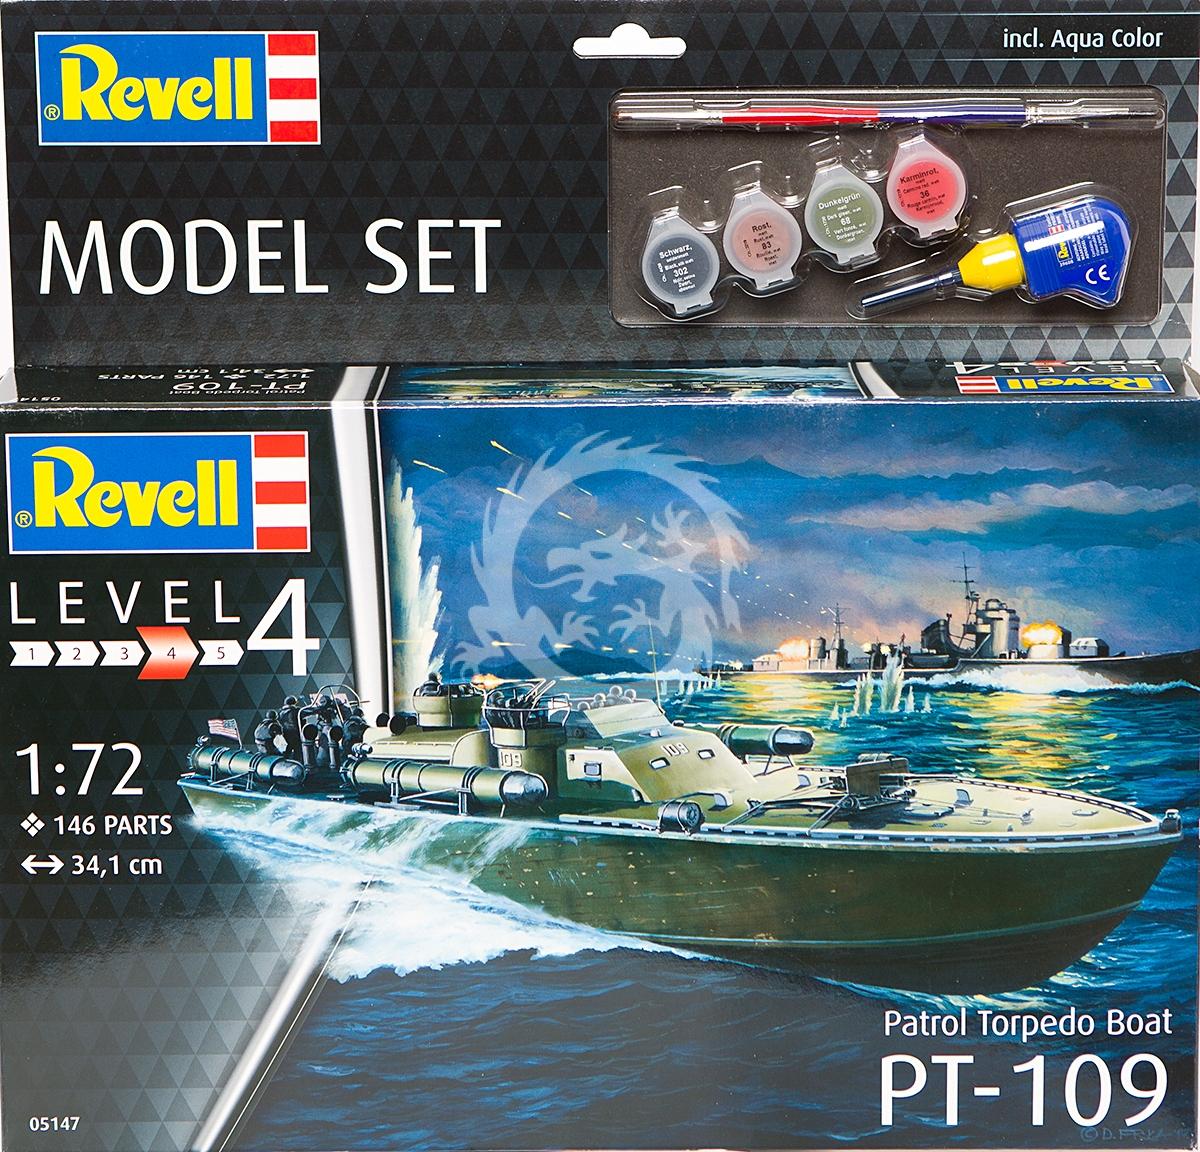 Patrol Torpedo Boat PT-109 Set Revell 65147 v 1/72